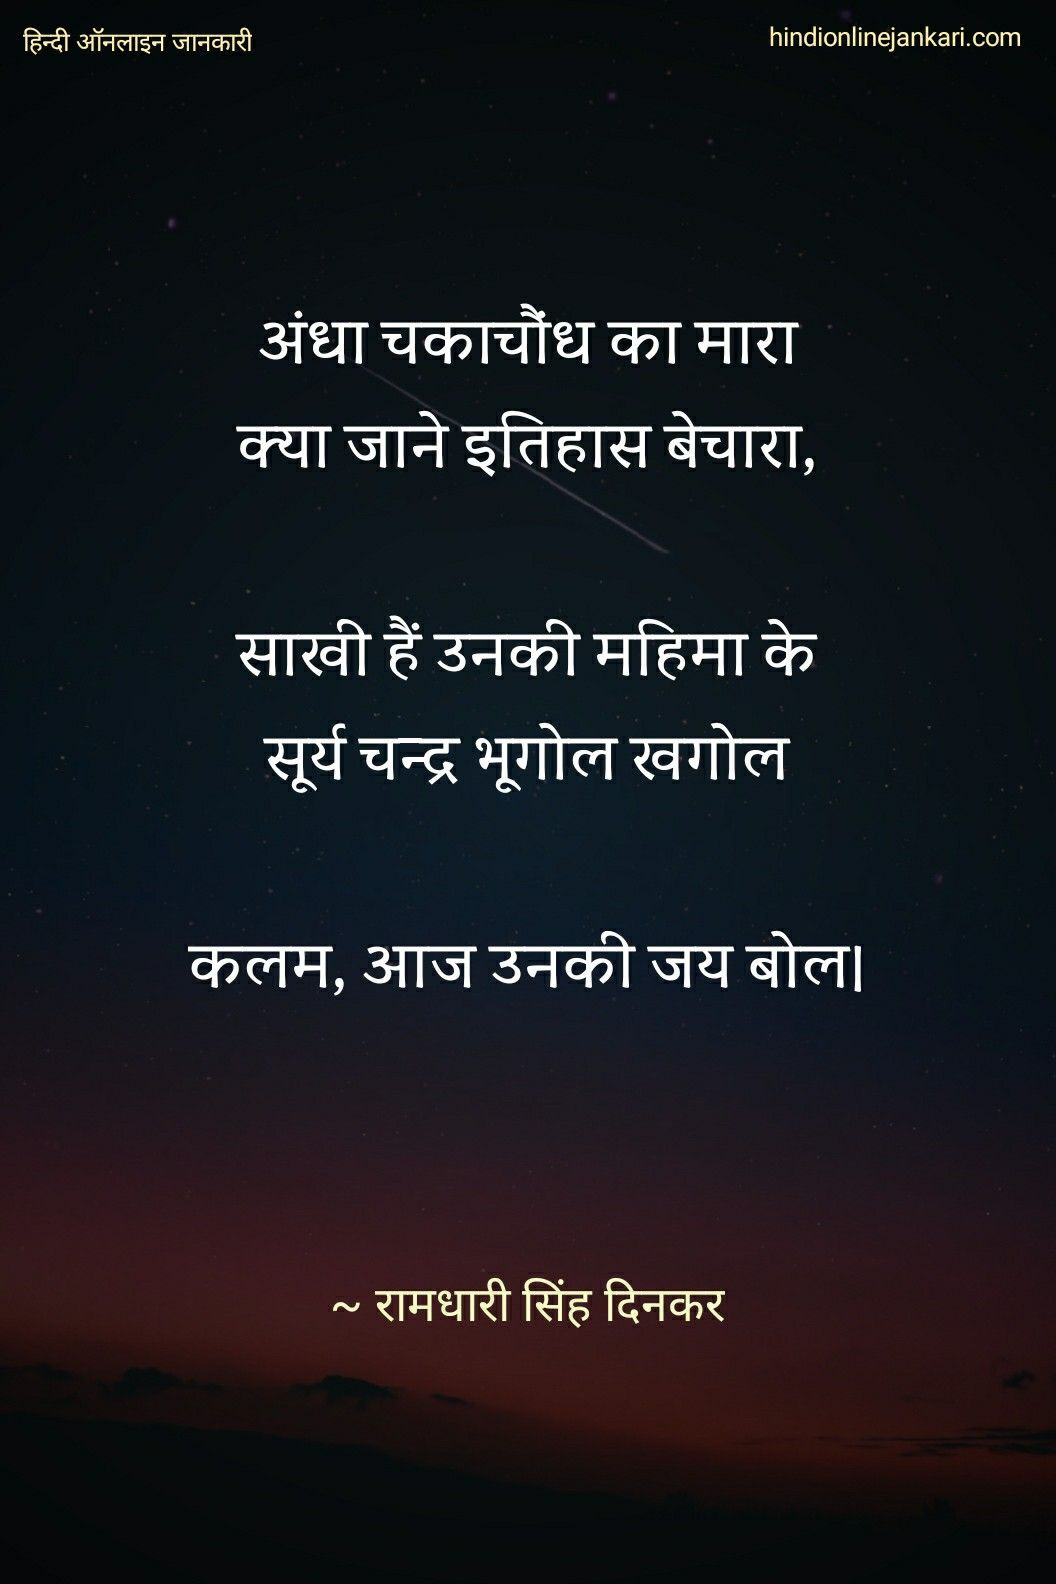 Ramdhari Singh Dinkar Poems In Hindi Ramdhari Singh Dinkar Quotes In Hindi Poems Hindi Quotes Zindagi Quotes [ 1584 x 1056 Pixel ]